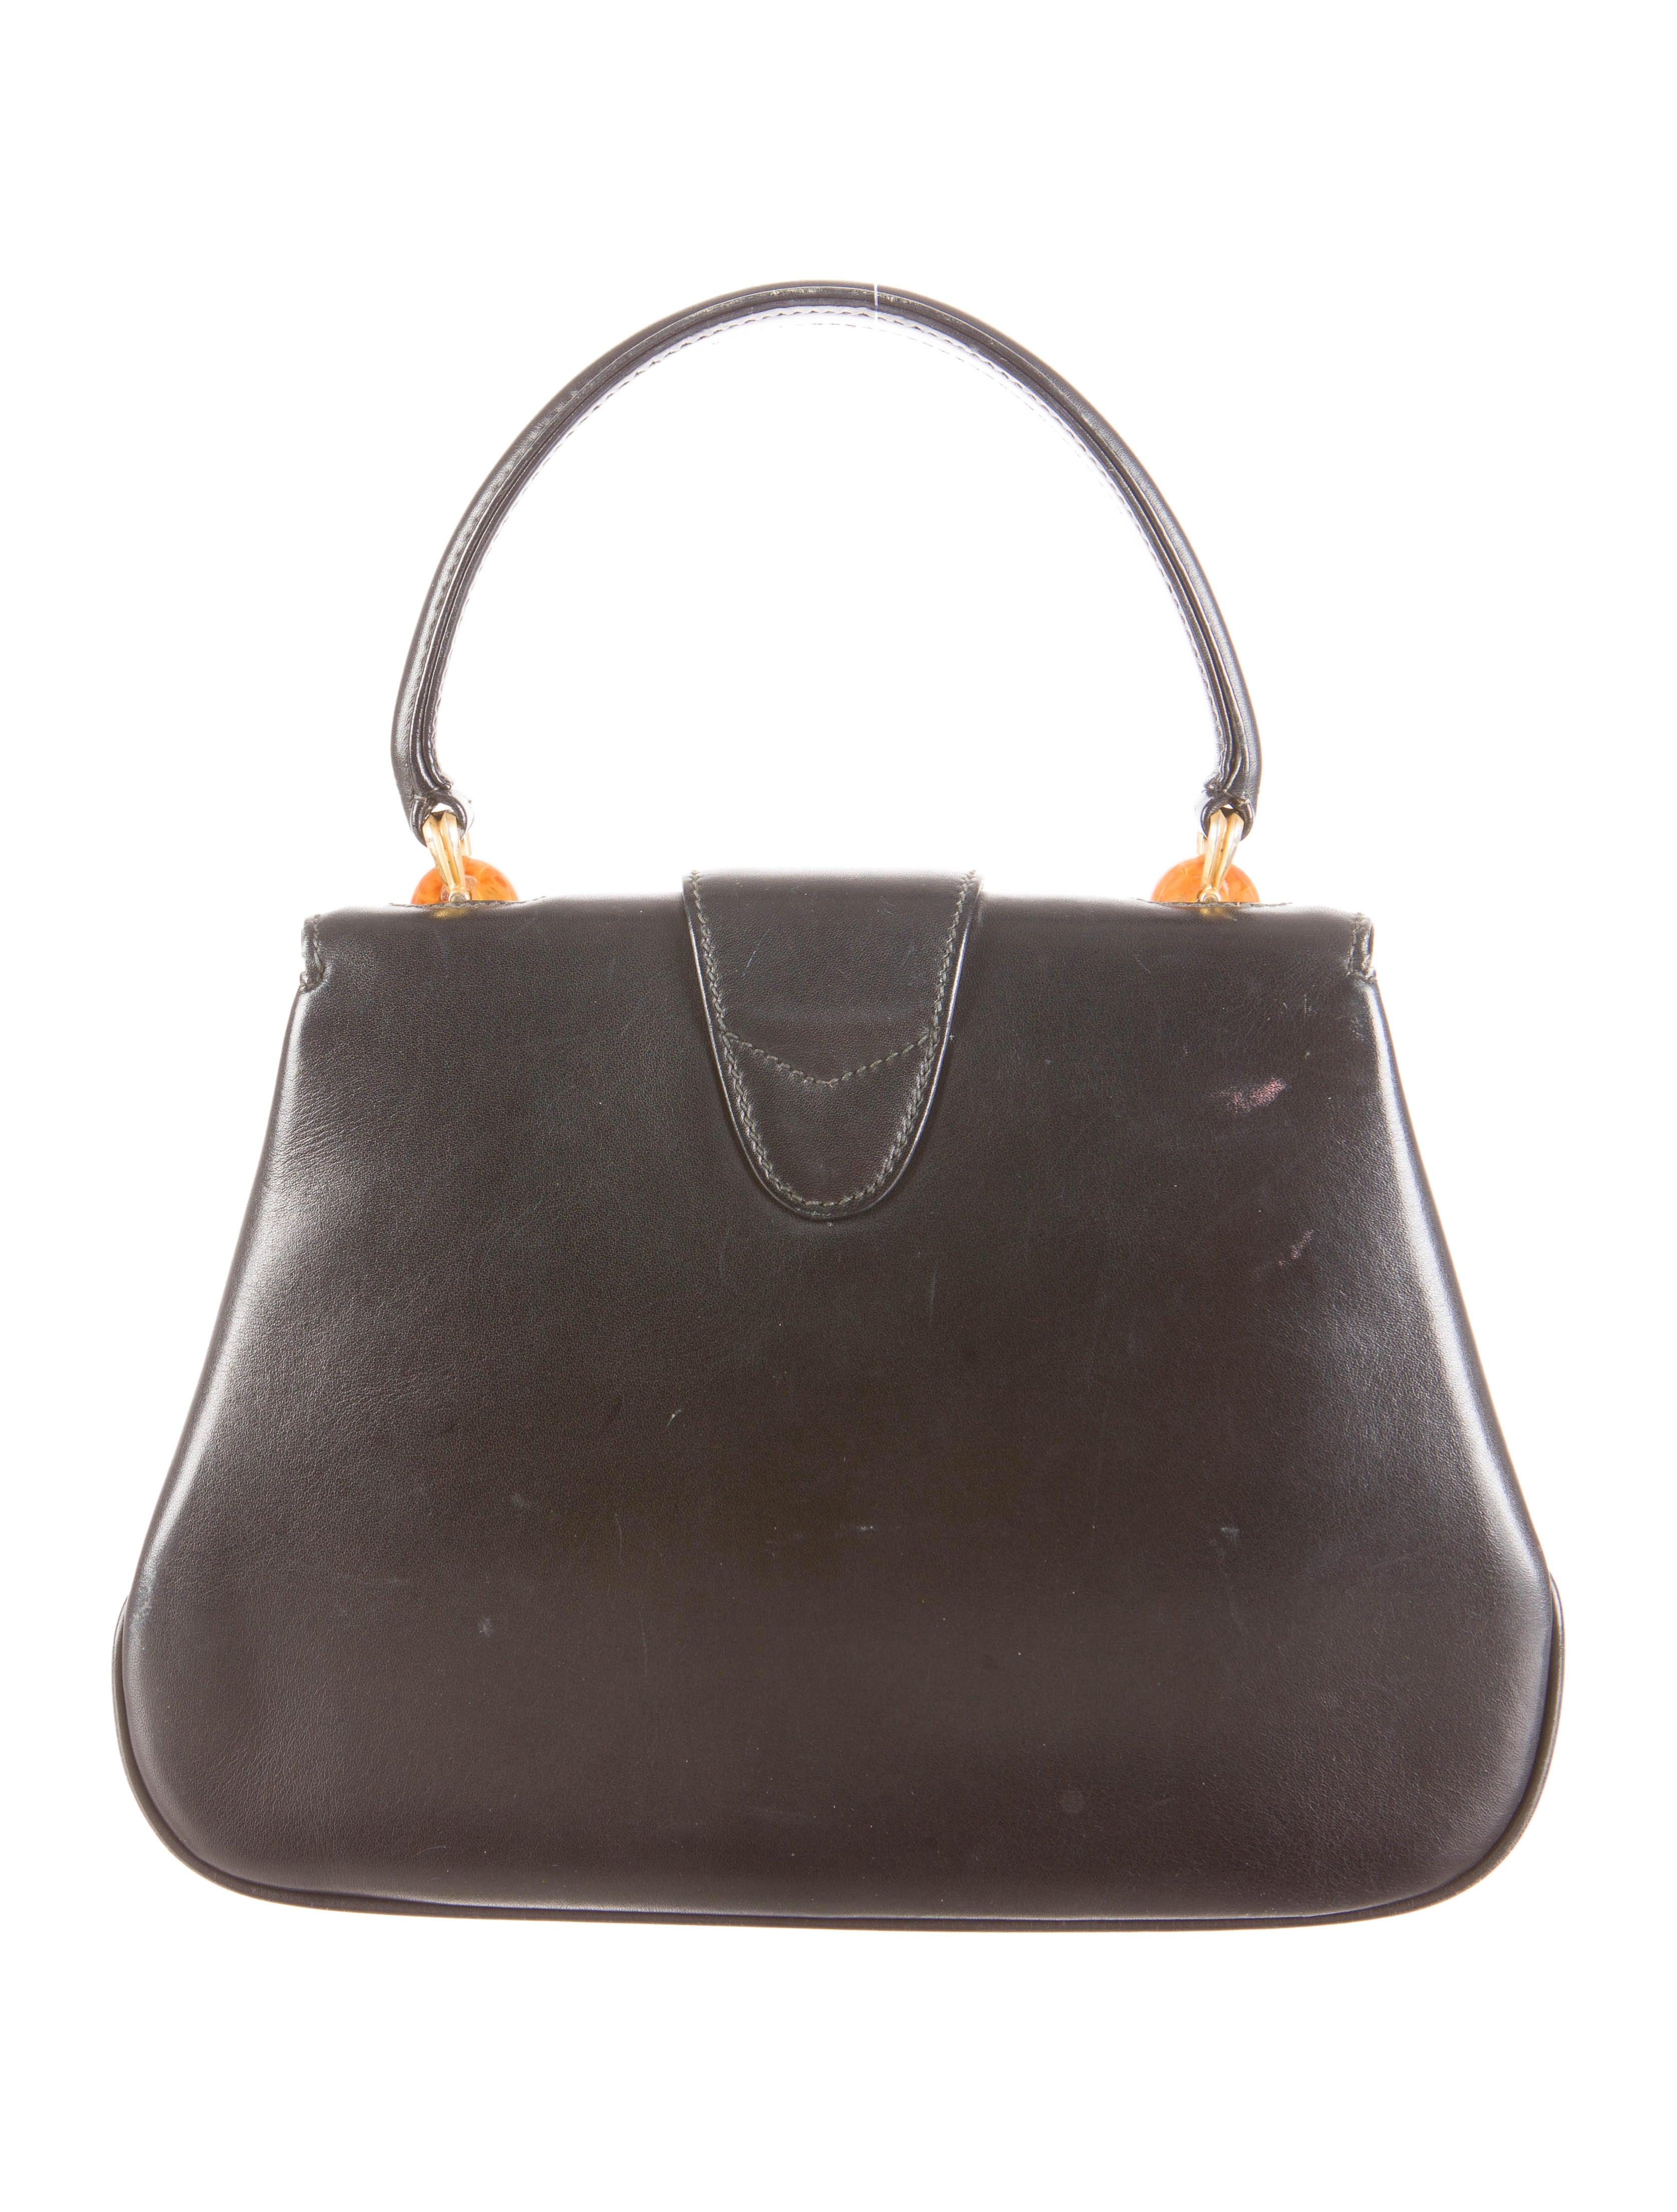 a3199b9846ca Gucci Vintage Black Leather Resin Turn Lock Top Handle Satchel Bag at  1stdibs